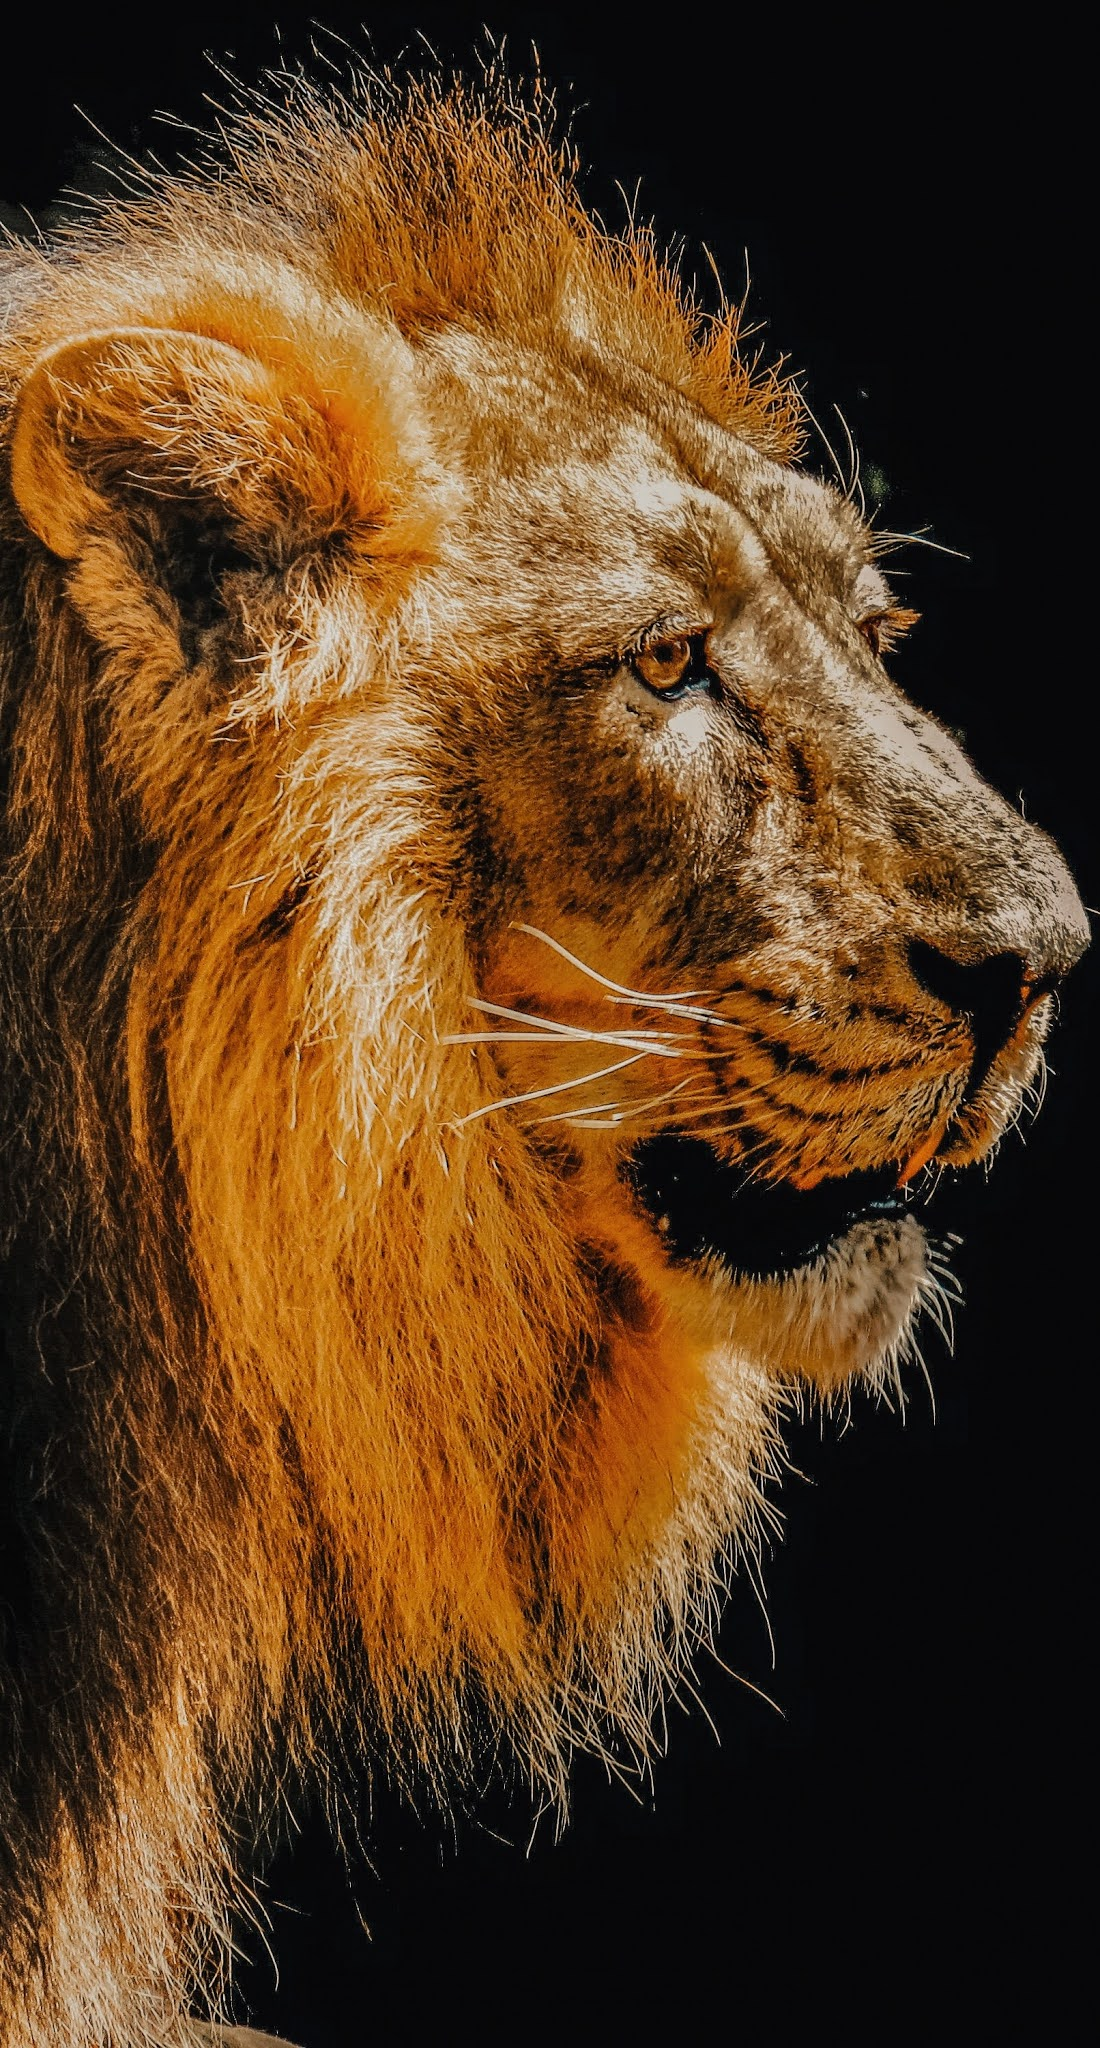 Photo of a majestic lion.